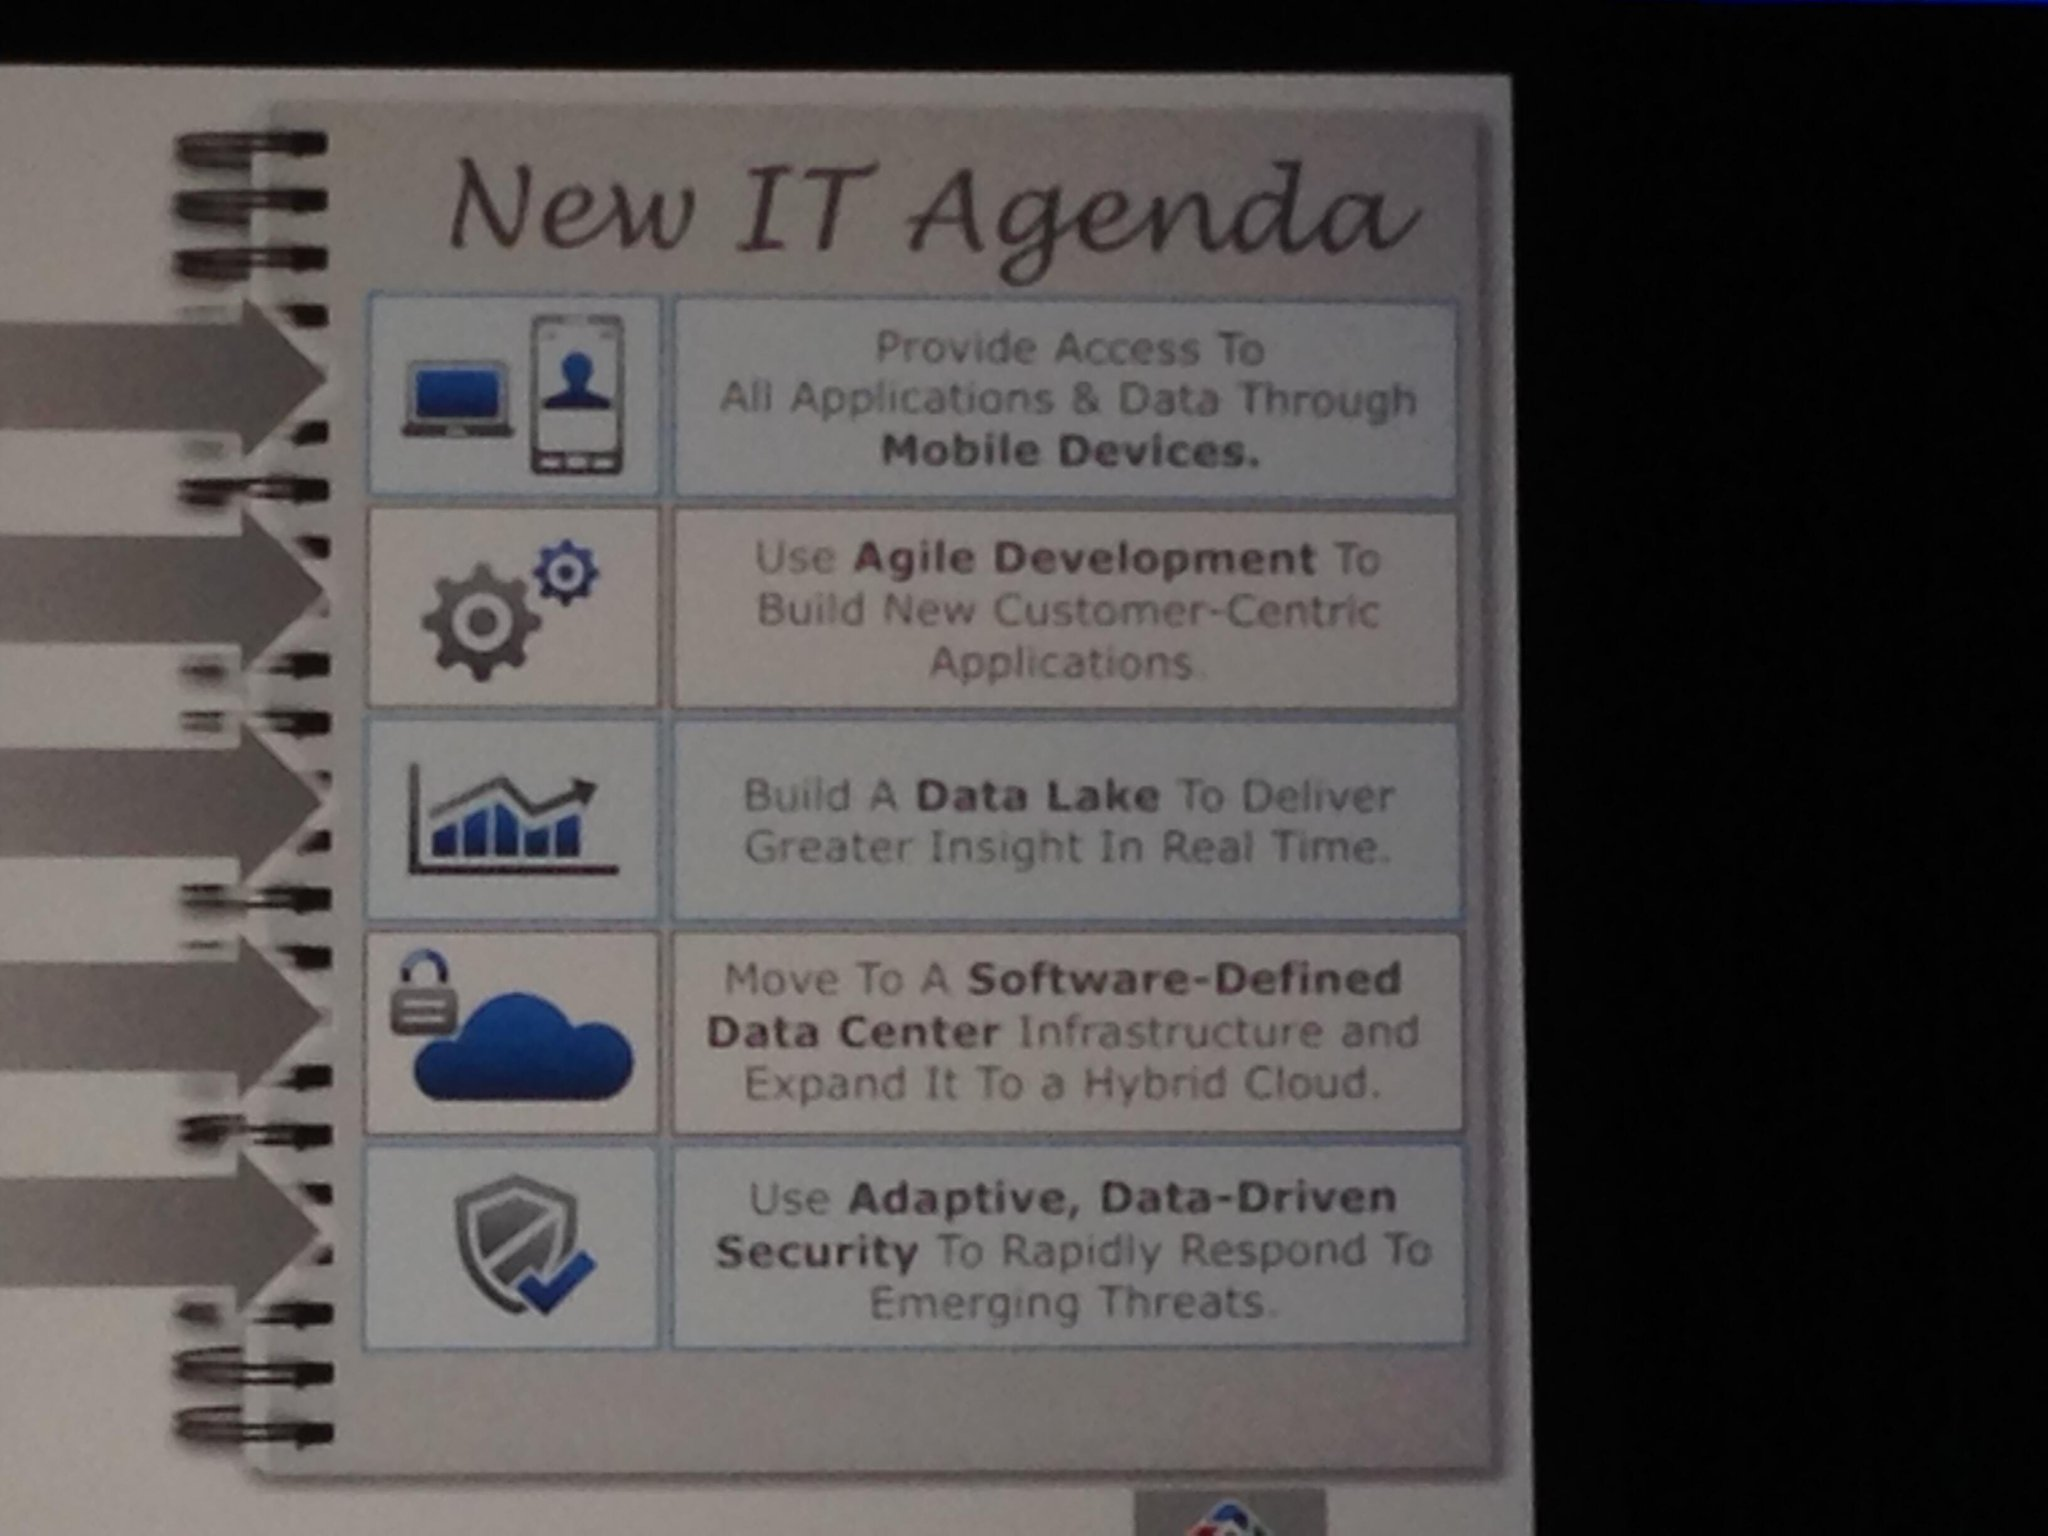 #emcworld - emc identifies new IT agenda http://t.co/ayFNz7VGSU